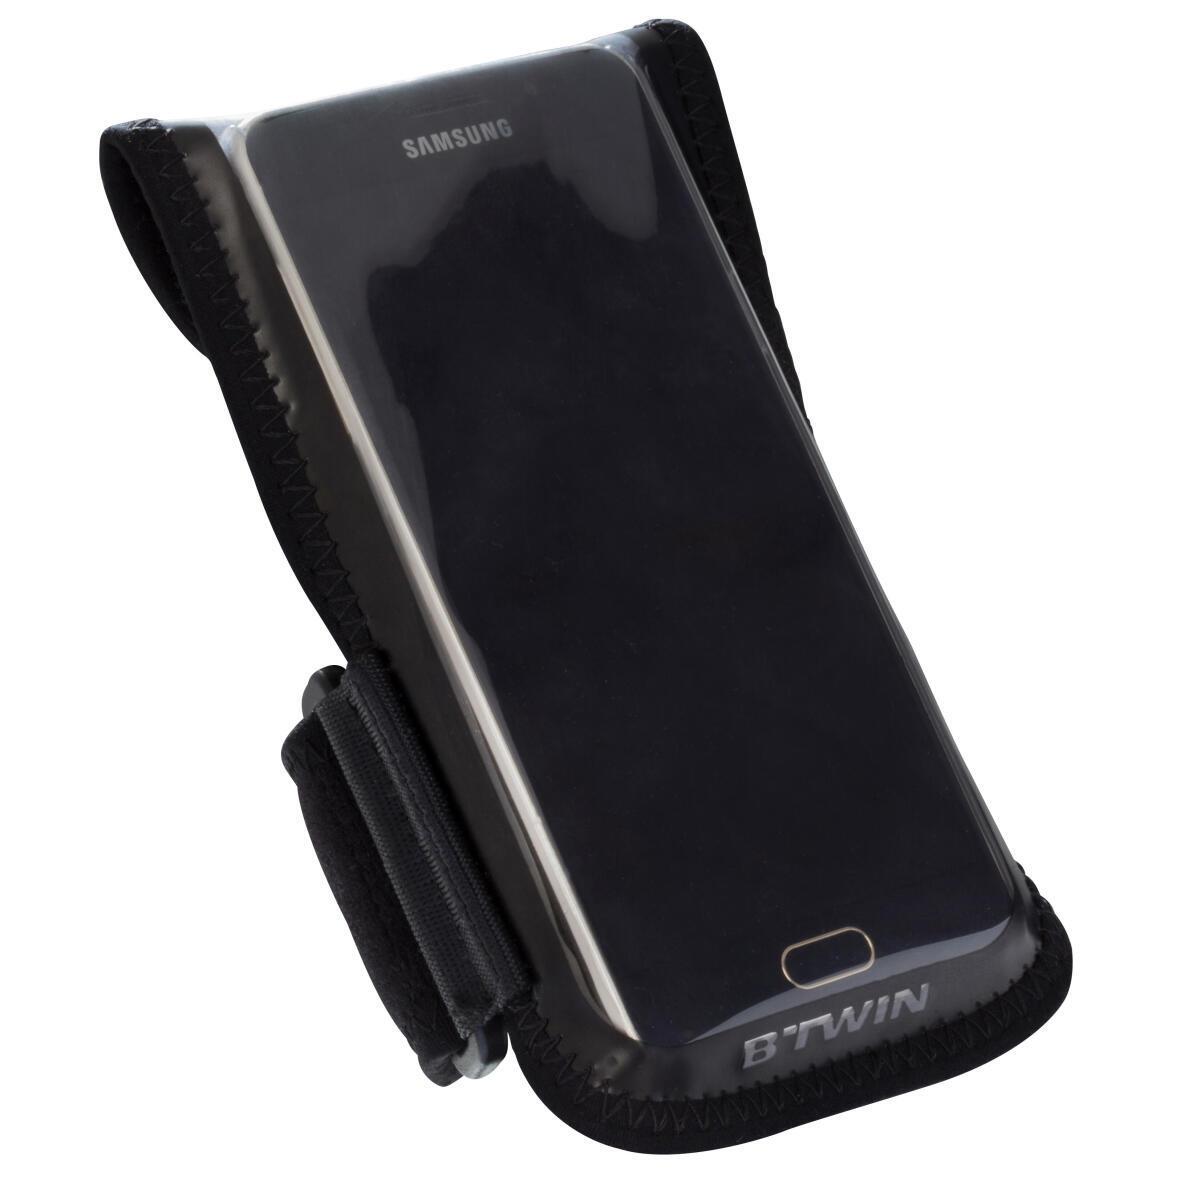 BTT ROCKRIDER ST 100 funda para smartphone compatible